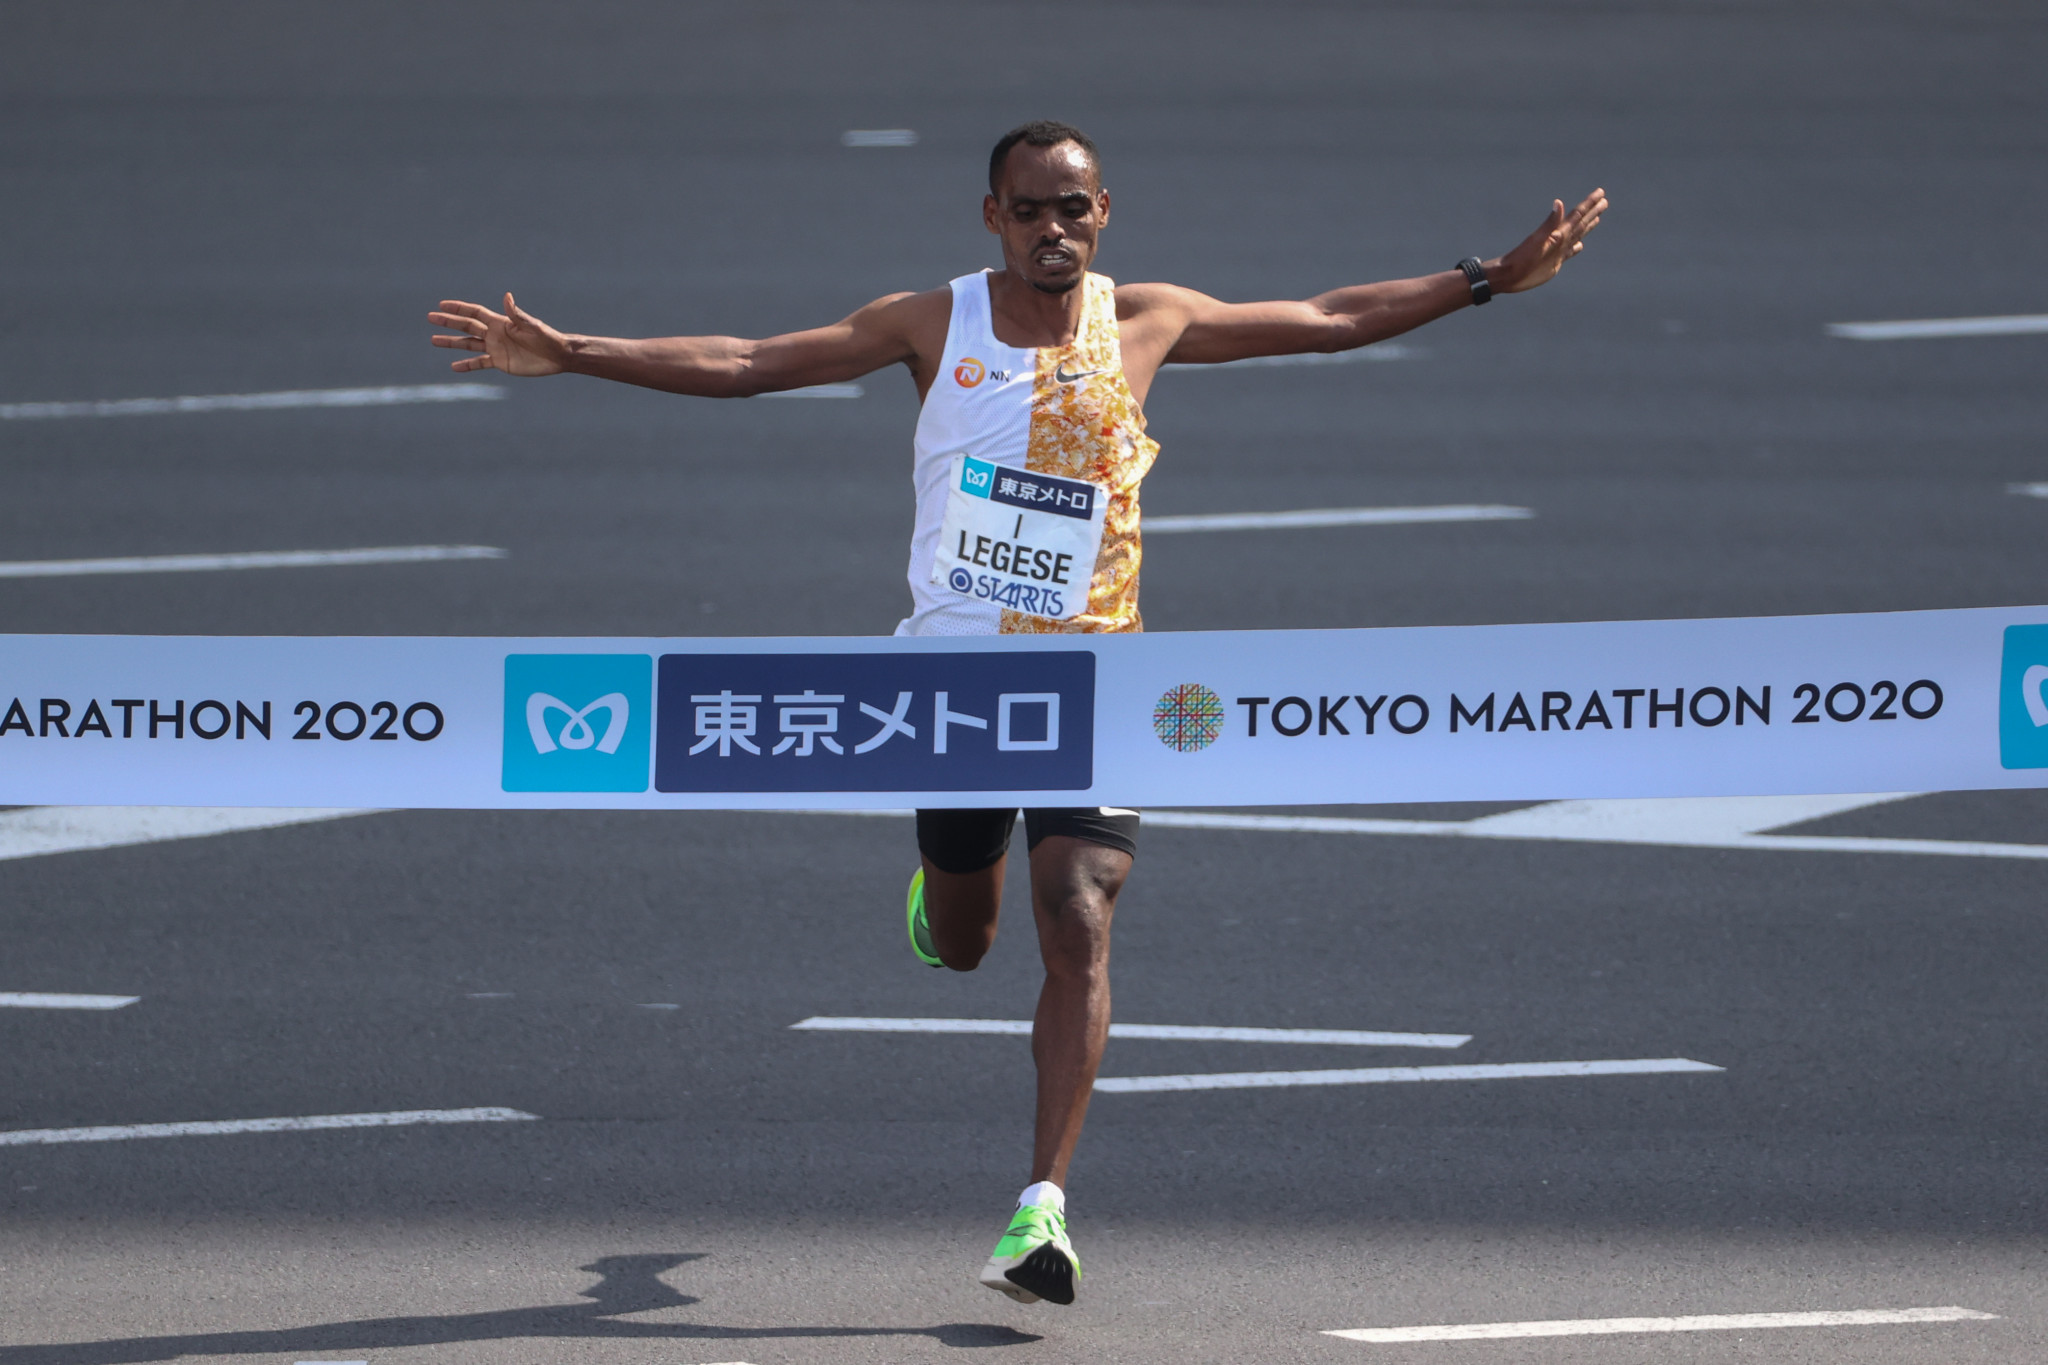 Legese defends men's Tokyo Marathon title at downsized event